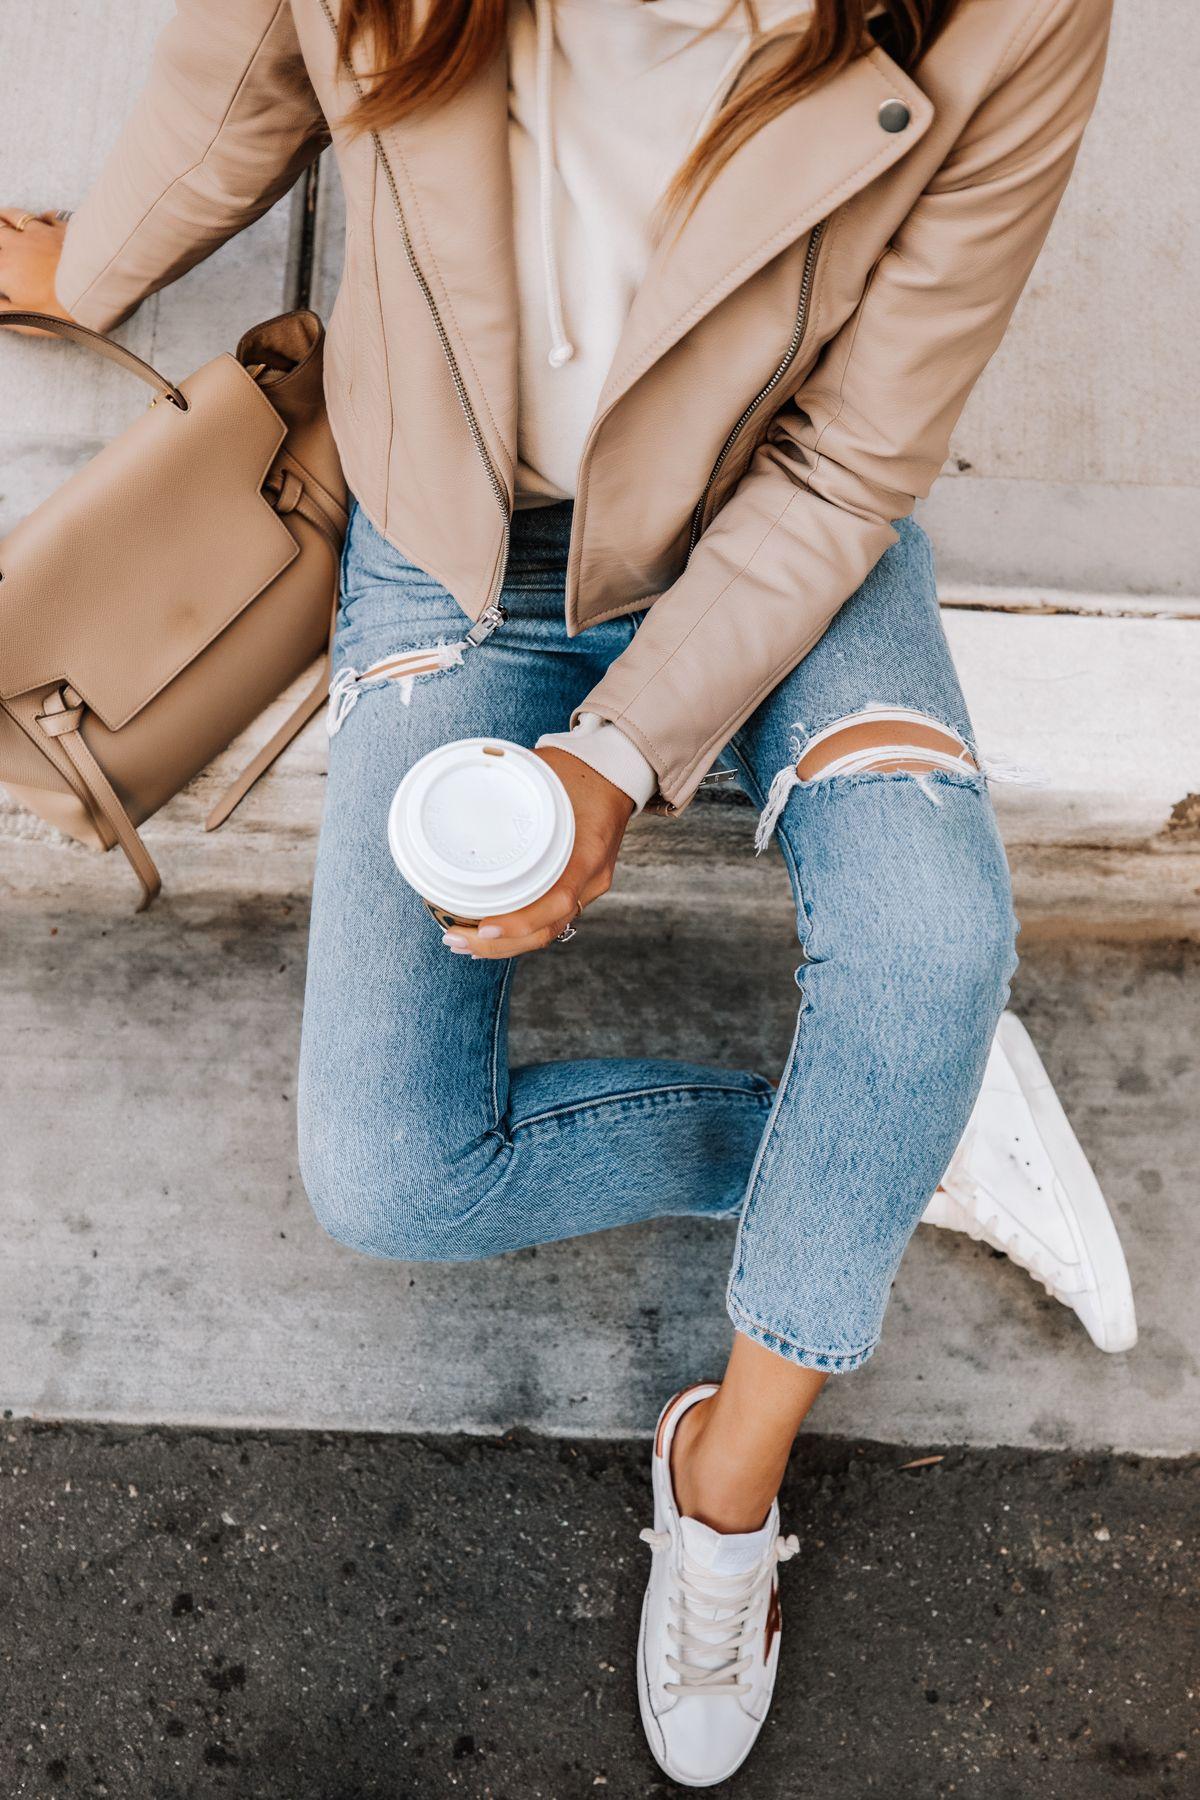 Fashion Jackson Wearing Abercrombie Tan Leather Jacket Beige Hoodie Levis Rip In 2021 Beige Leather Jacket Outfit Tan Leather Jacket Outfit White Leather Jacket Outfit [ 1800 x 1200 Pixel ]